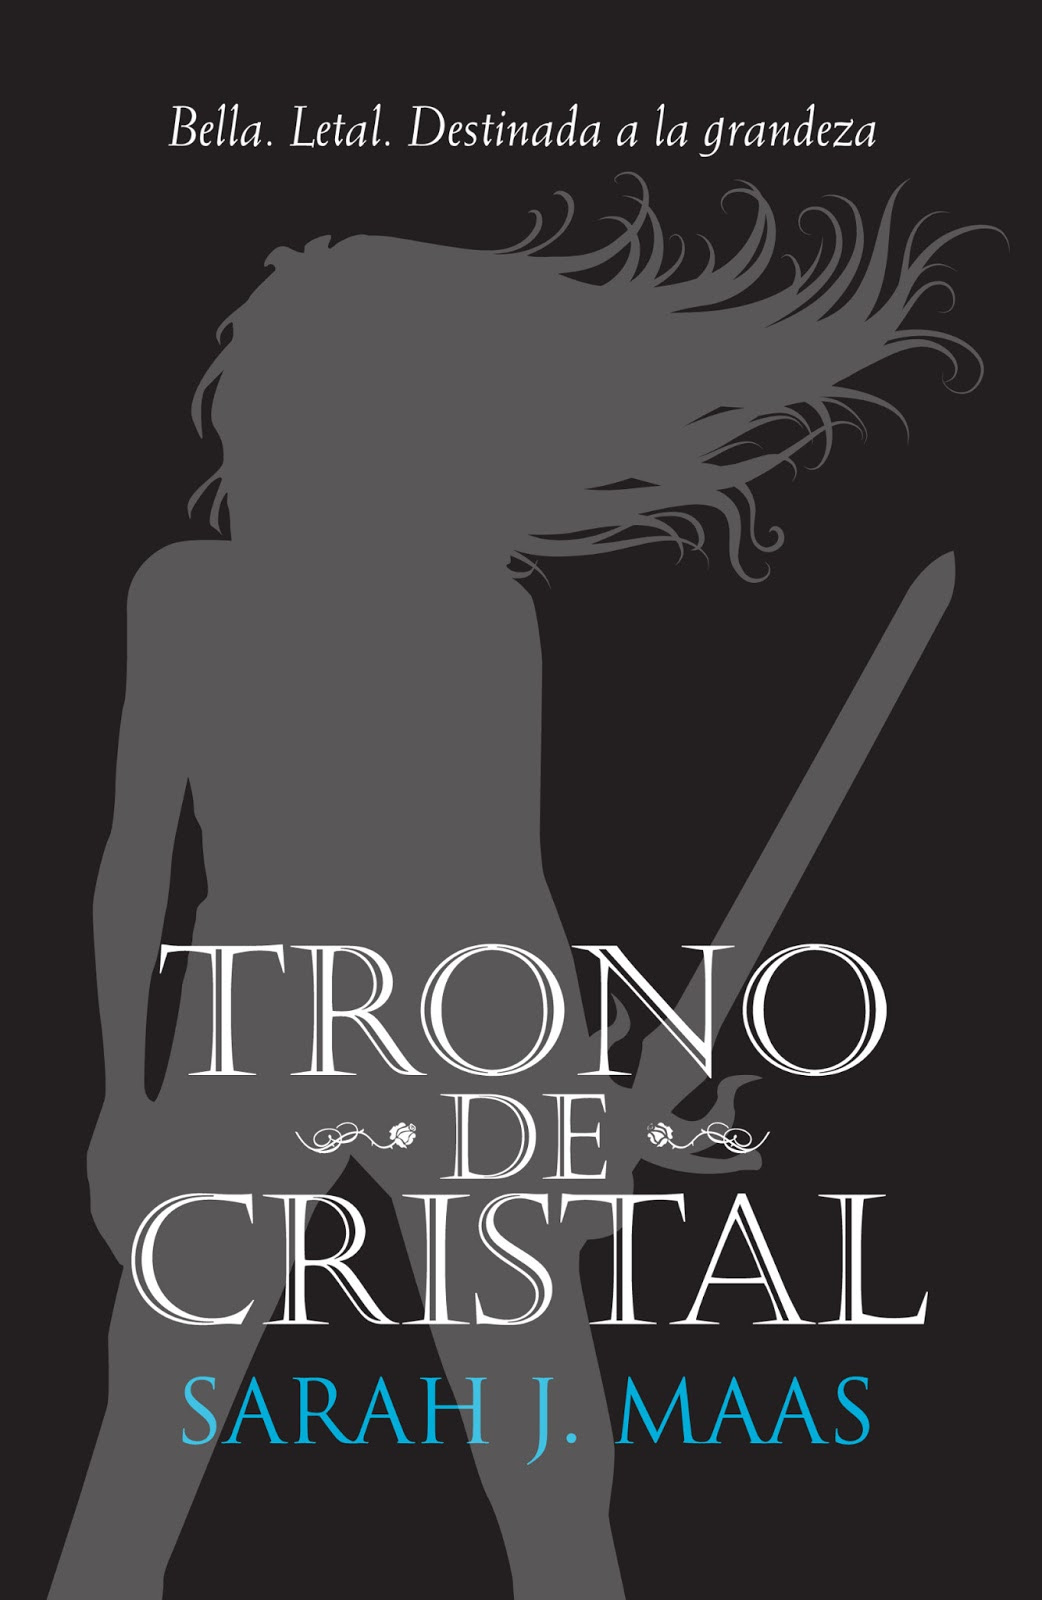 http://unlibrero.blogspot.mx/2014/08/trono-de-cristal-1-sarah-j-maas.html